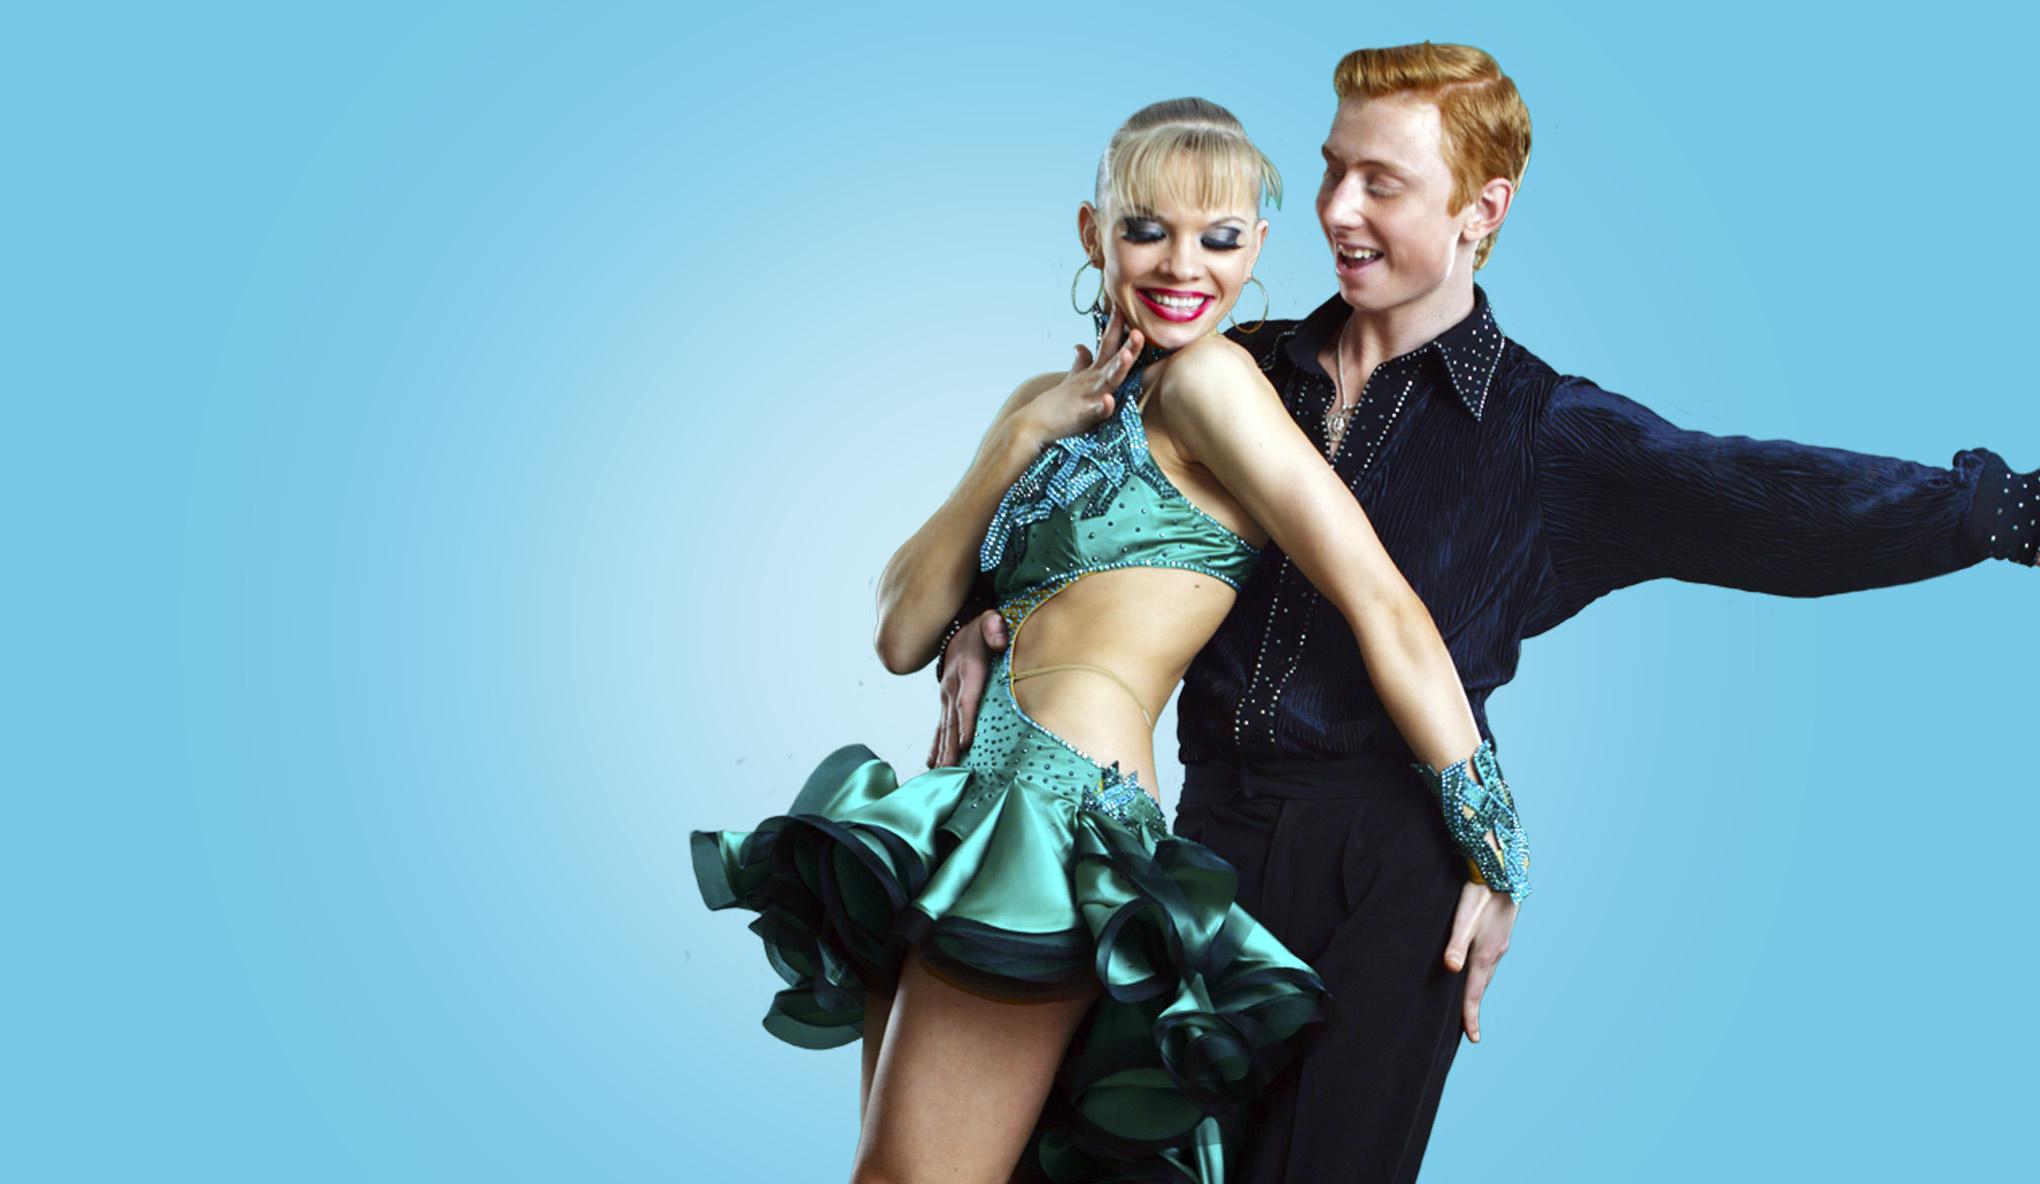 ballroom-dance-couple-muge.jpg